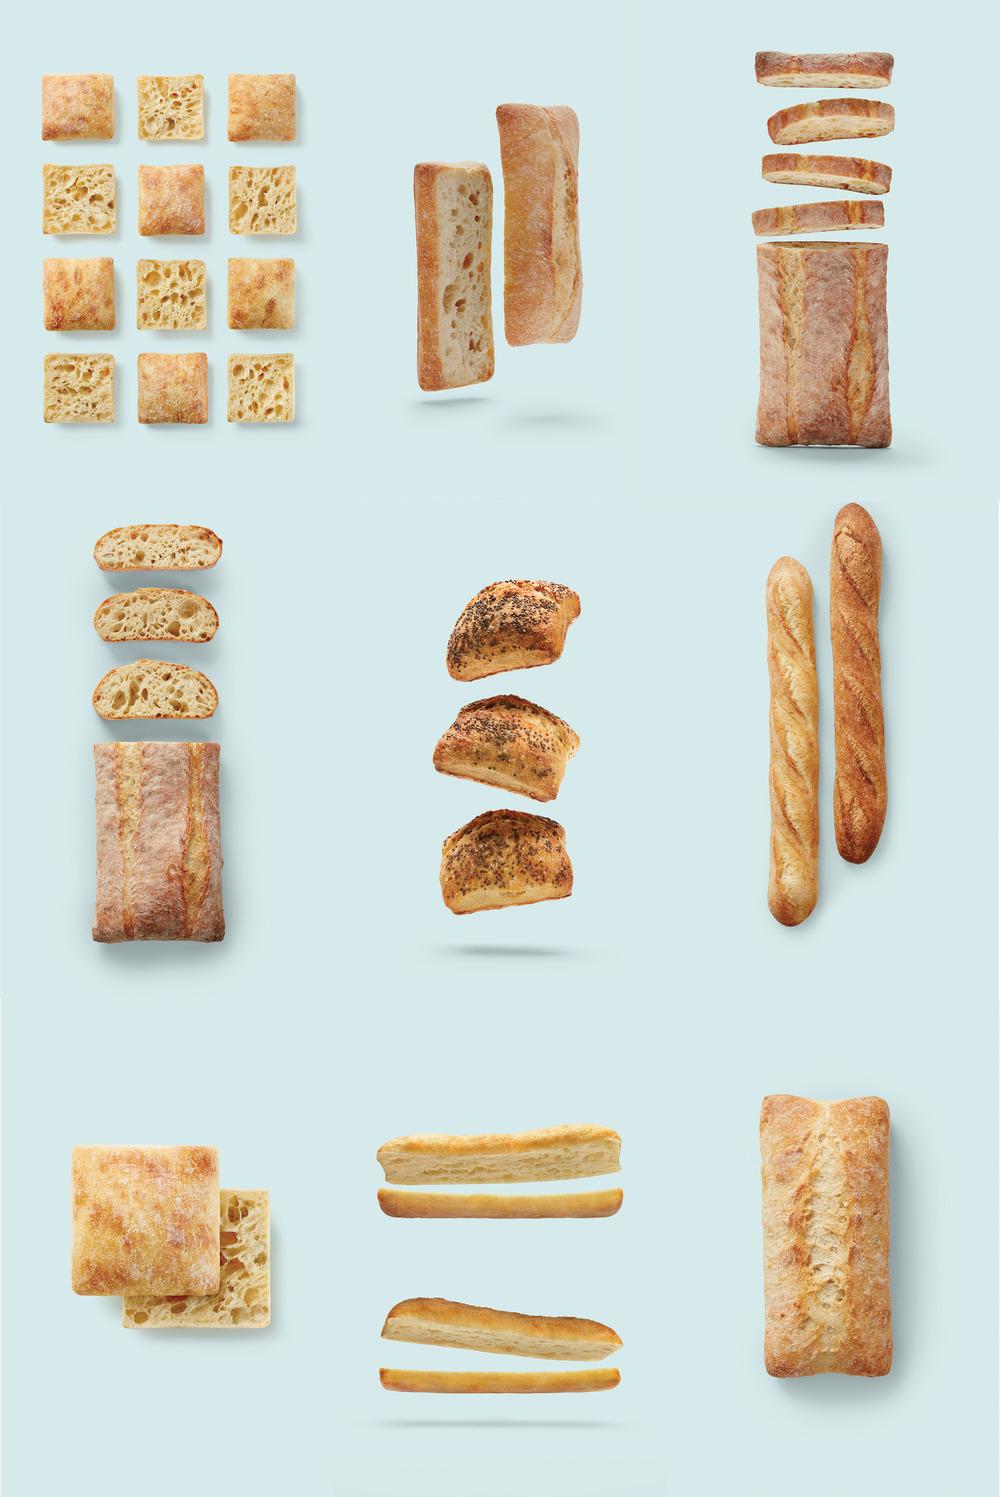 boulartbread